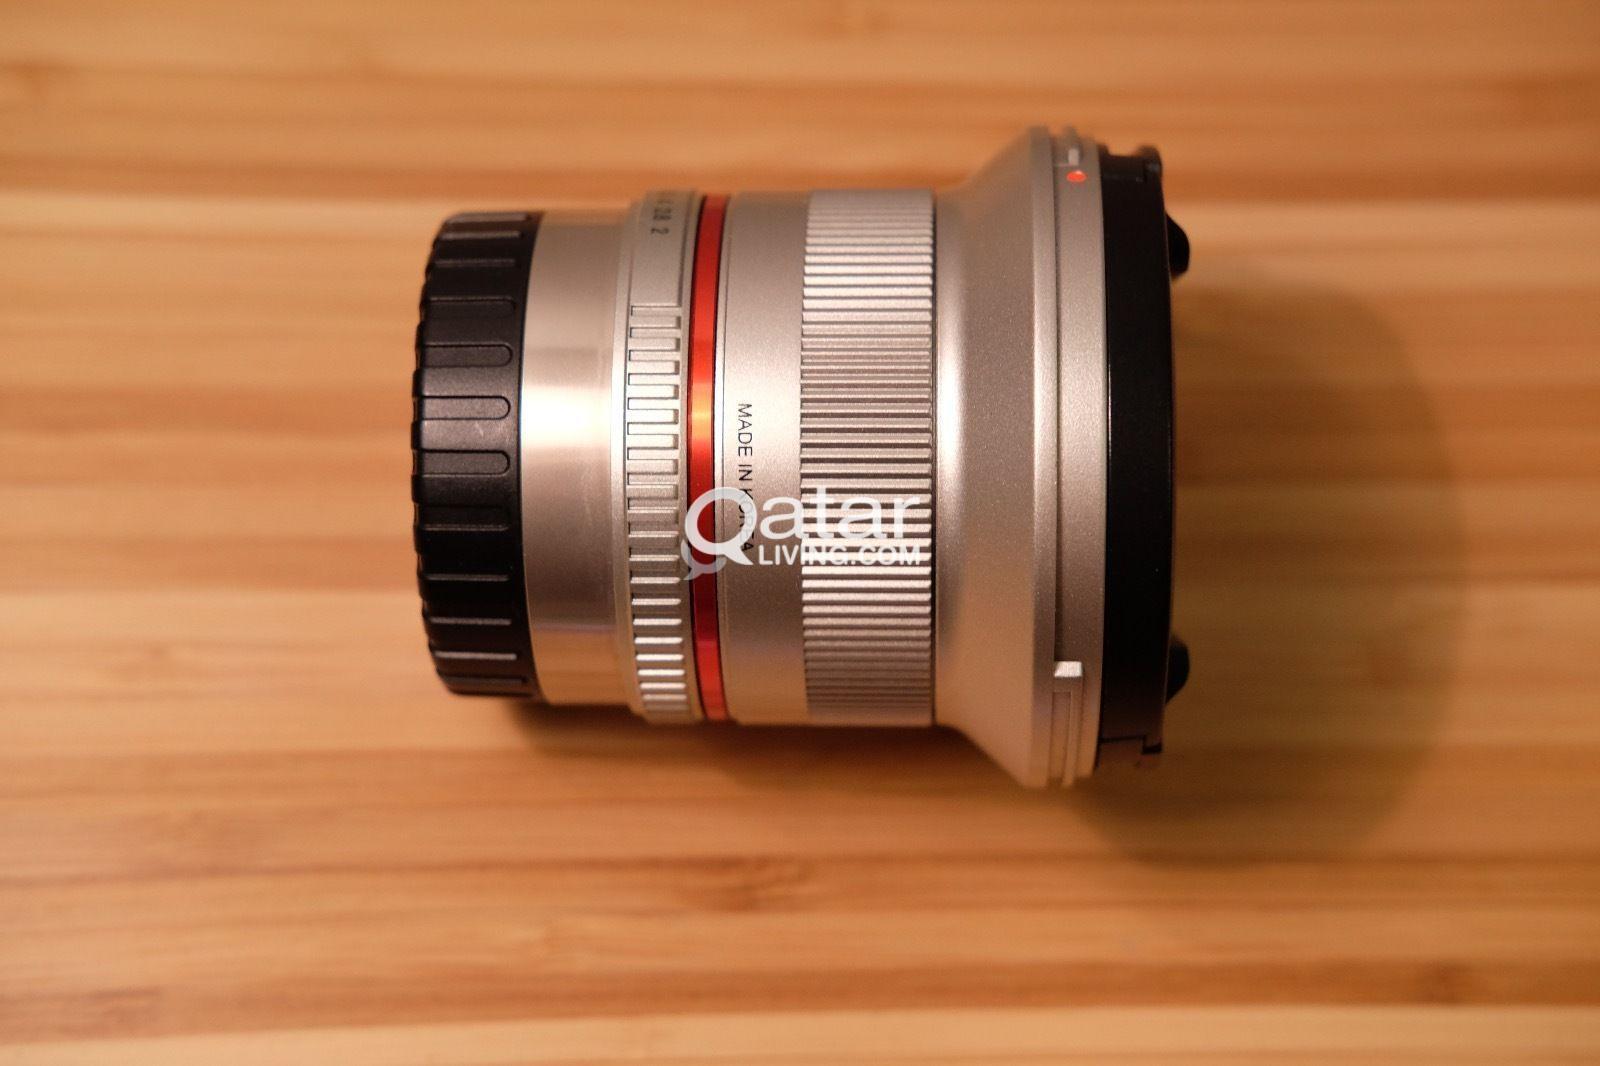 Rokinon 12mm F2 0 Ultra Wide Angle Lens for Fujifilm X-Mount